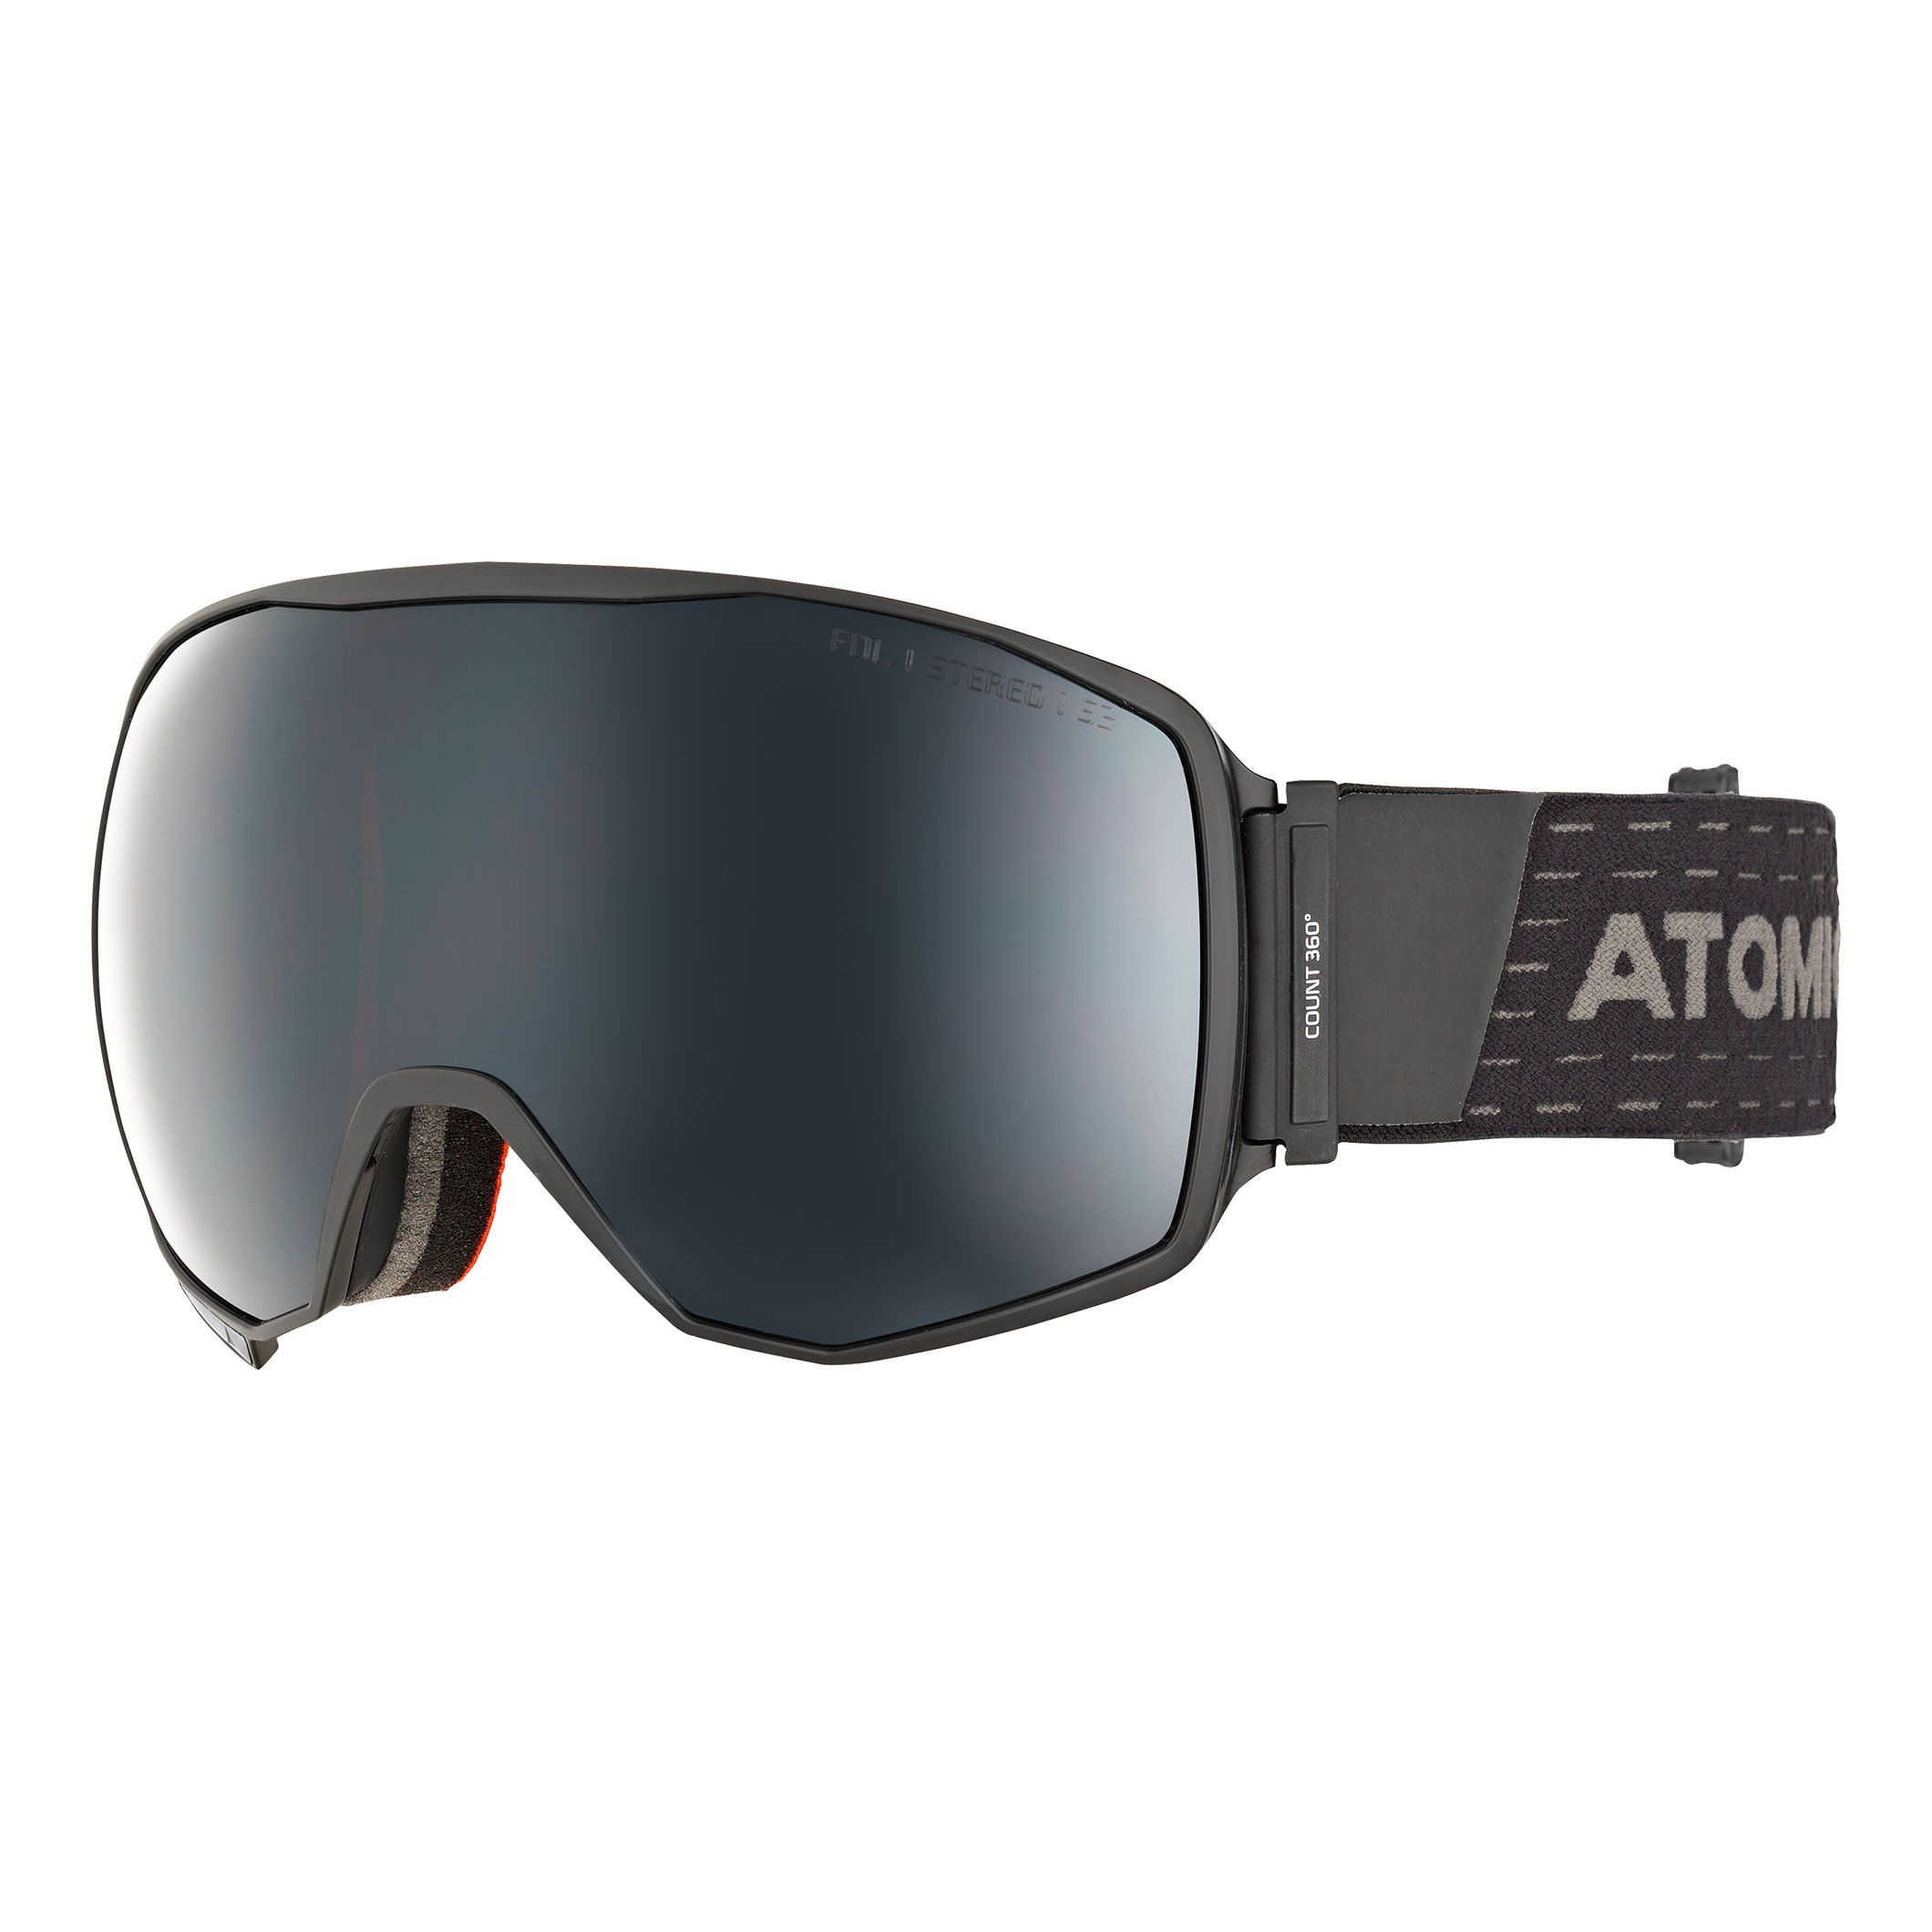 443e6bee257c The 8 Best Over-Glasses Ski & Snowboard Goggles of 2019